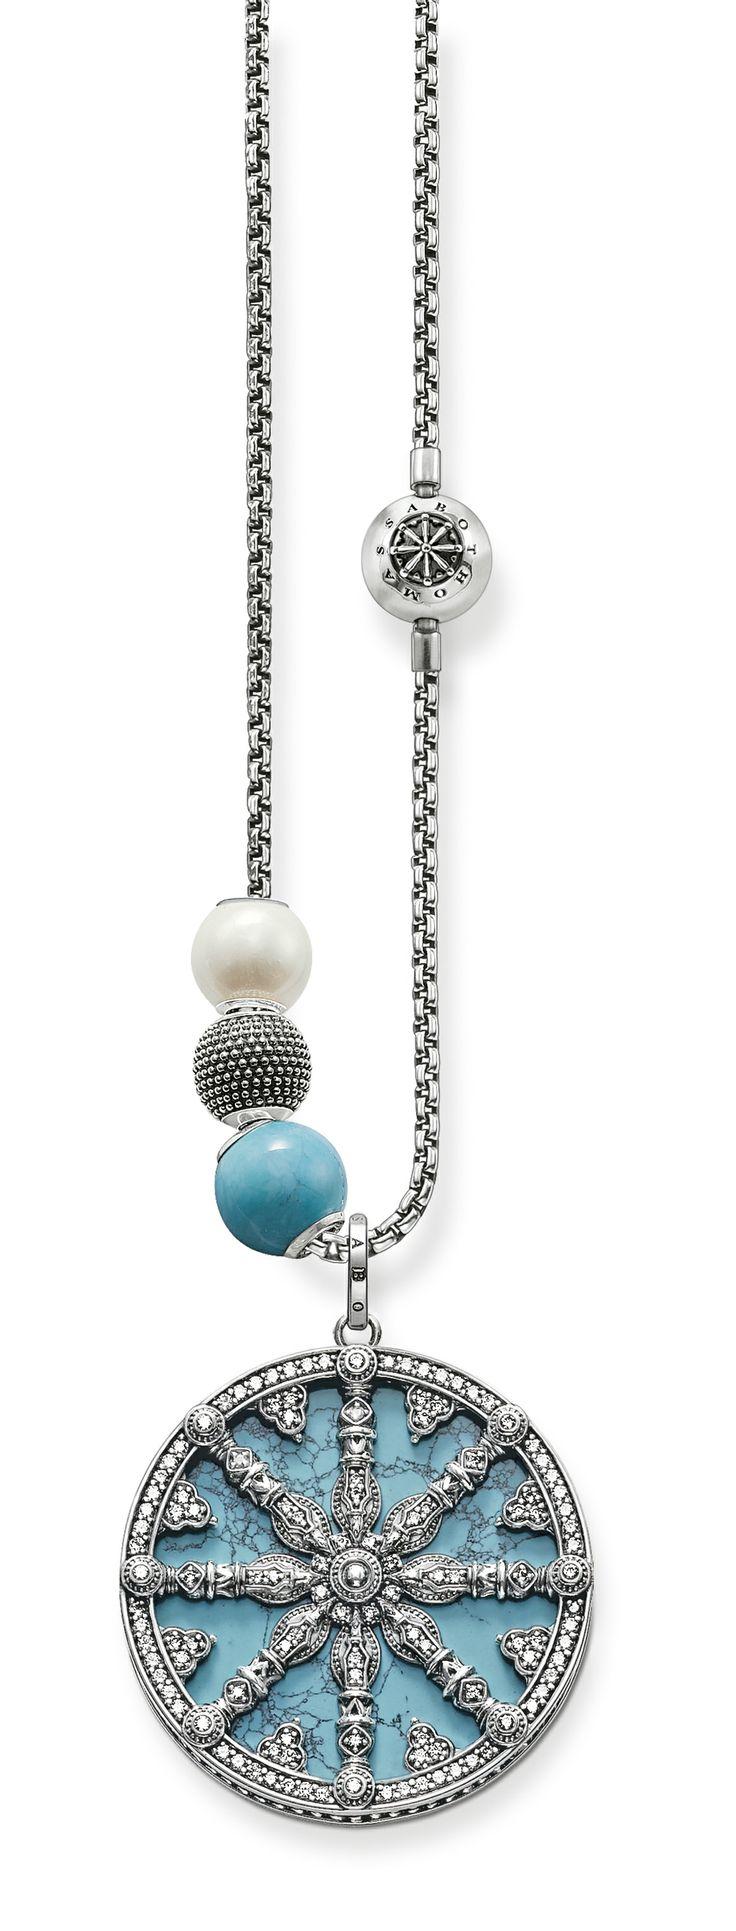 Just the chain Chris! Summer #feeling by #THOMASSABO: http://shop.thomassabo.com/XX-xx/sterling-silver/karma-beads/anhaenger/ov